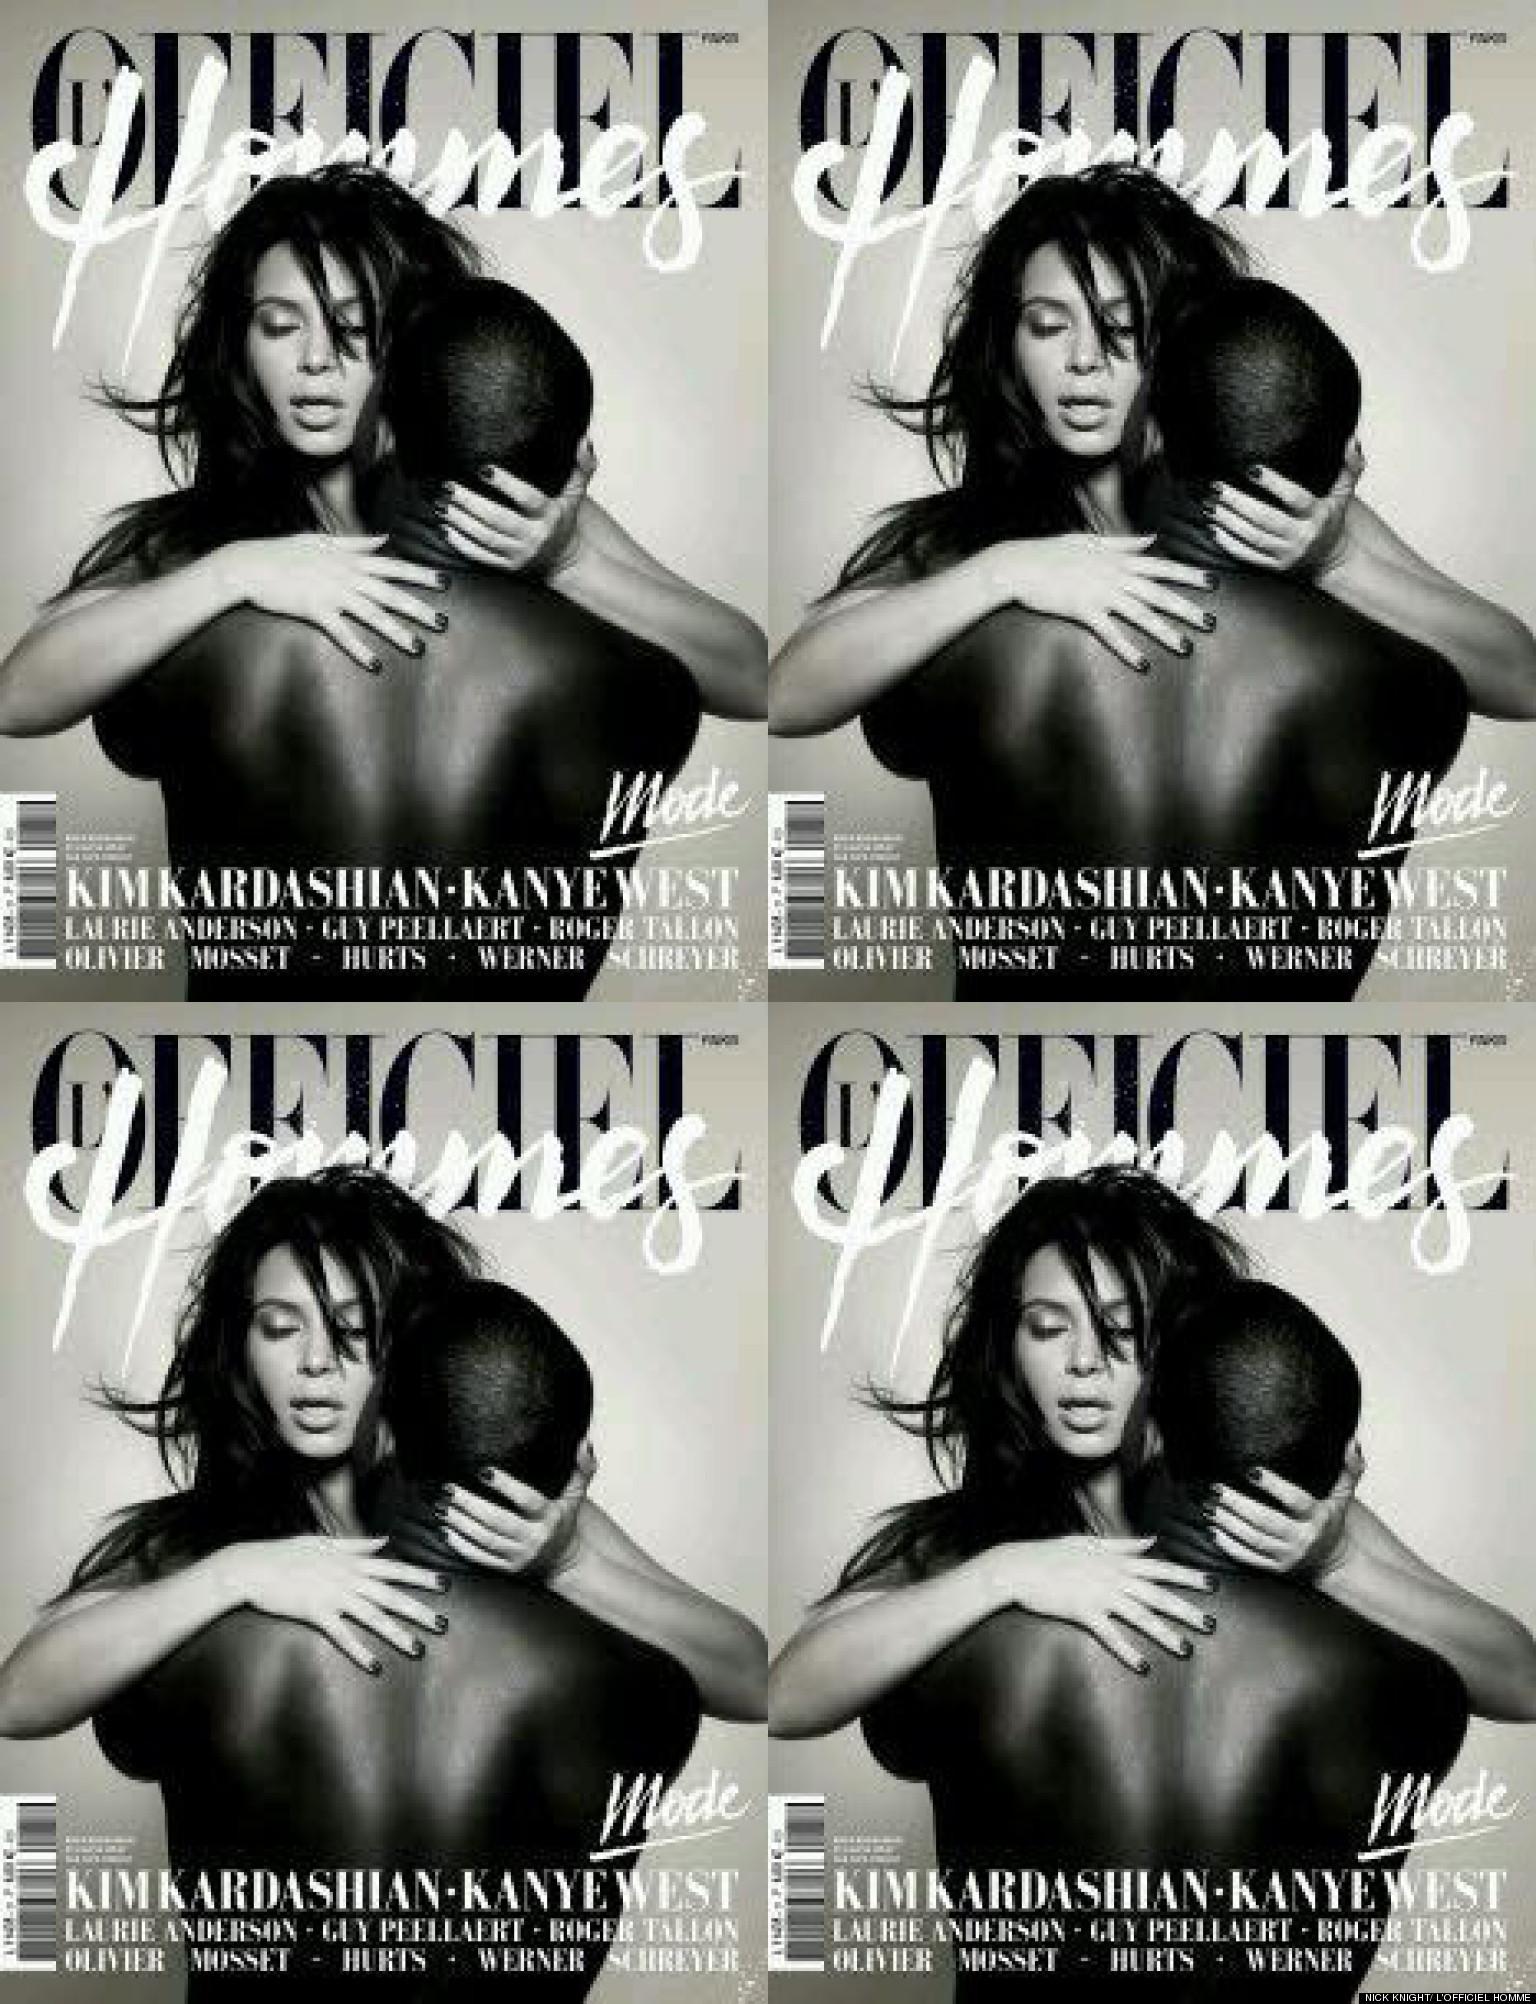 Kim Kardashian & Kanye West's Racy Nude Magazine Cover